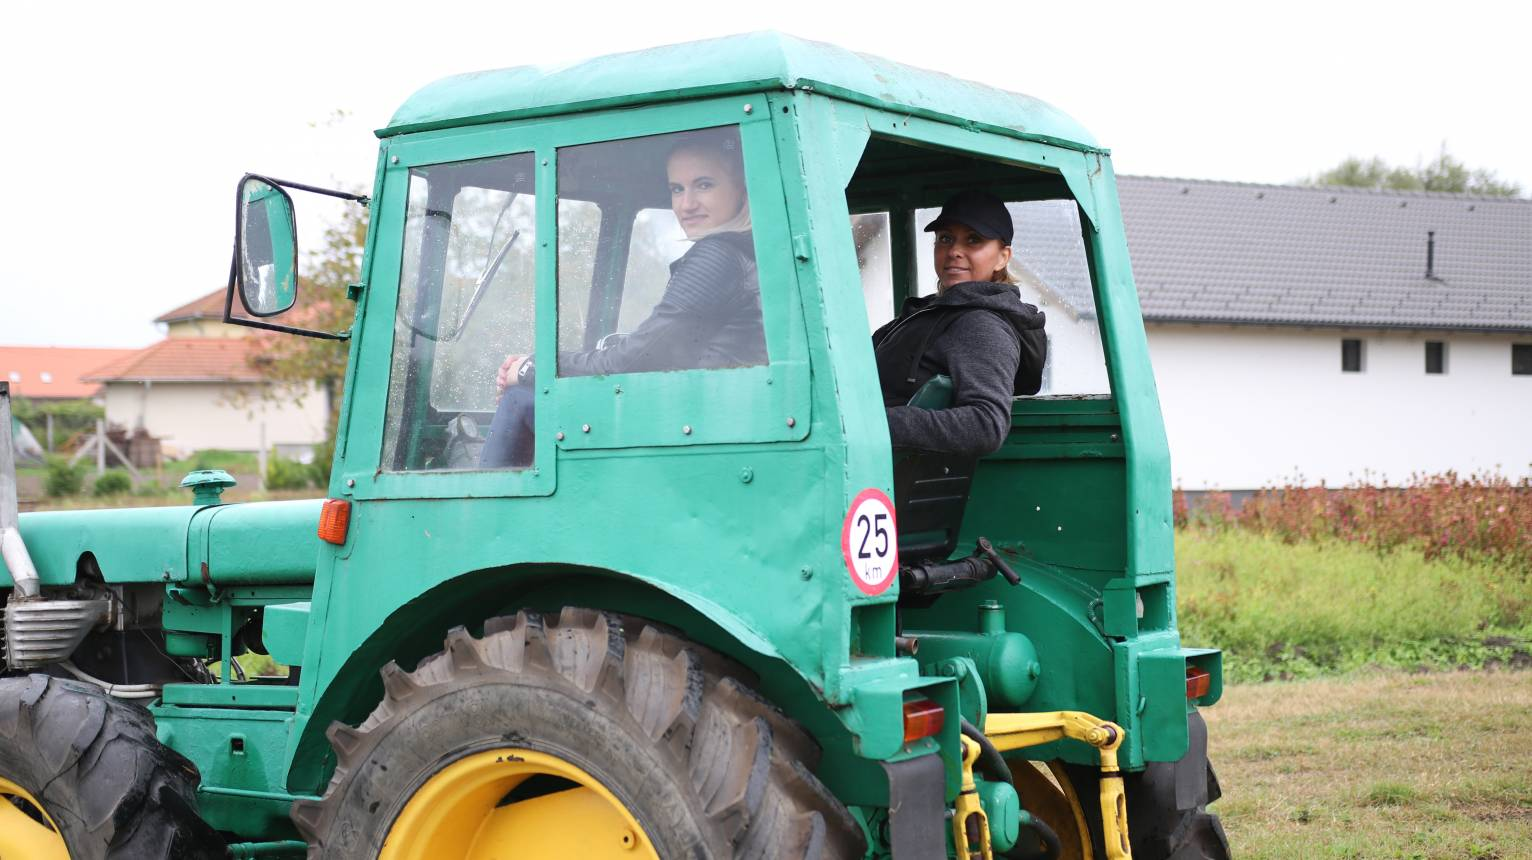 Dutra UE28-as traktor vezetése